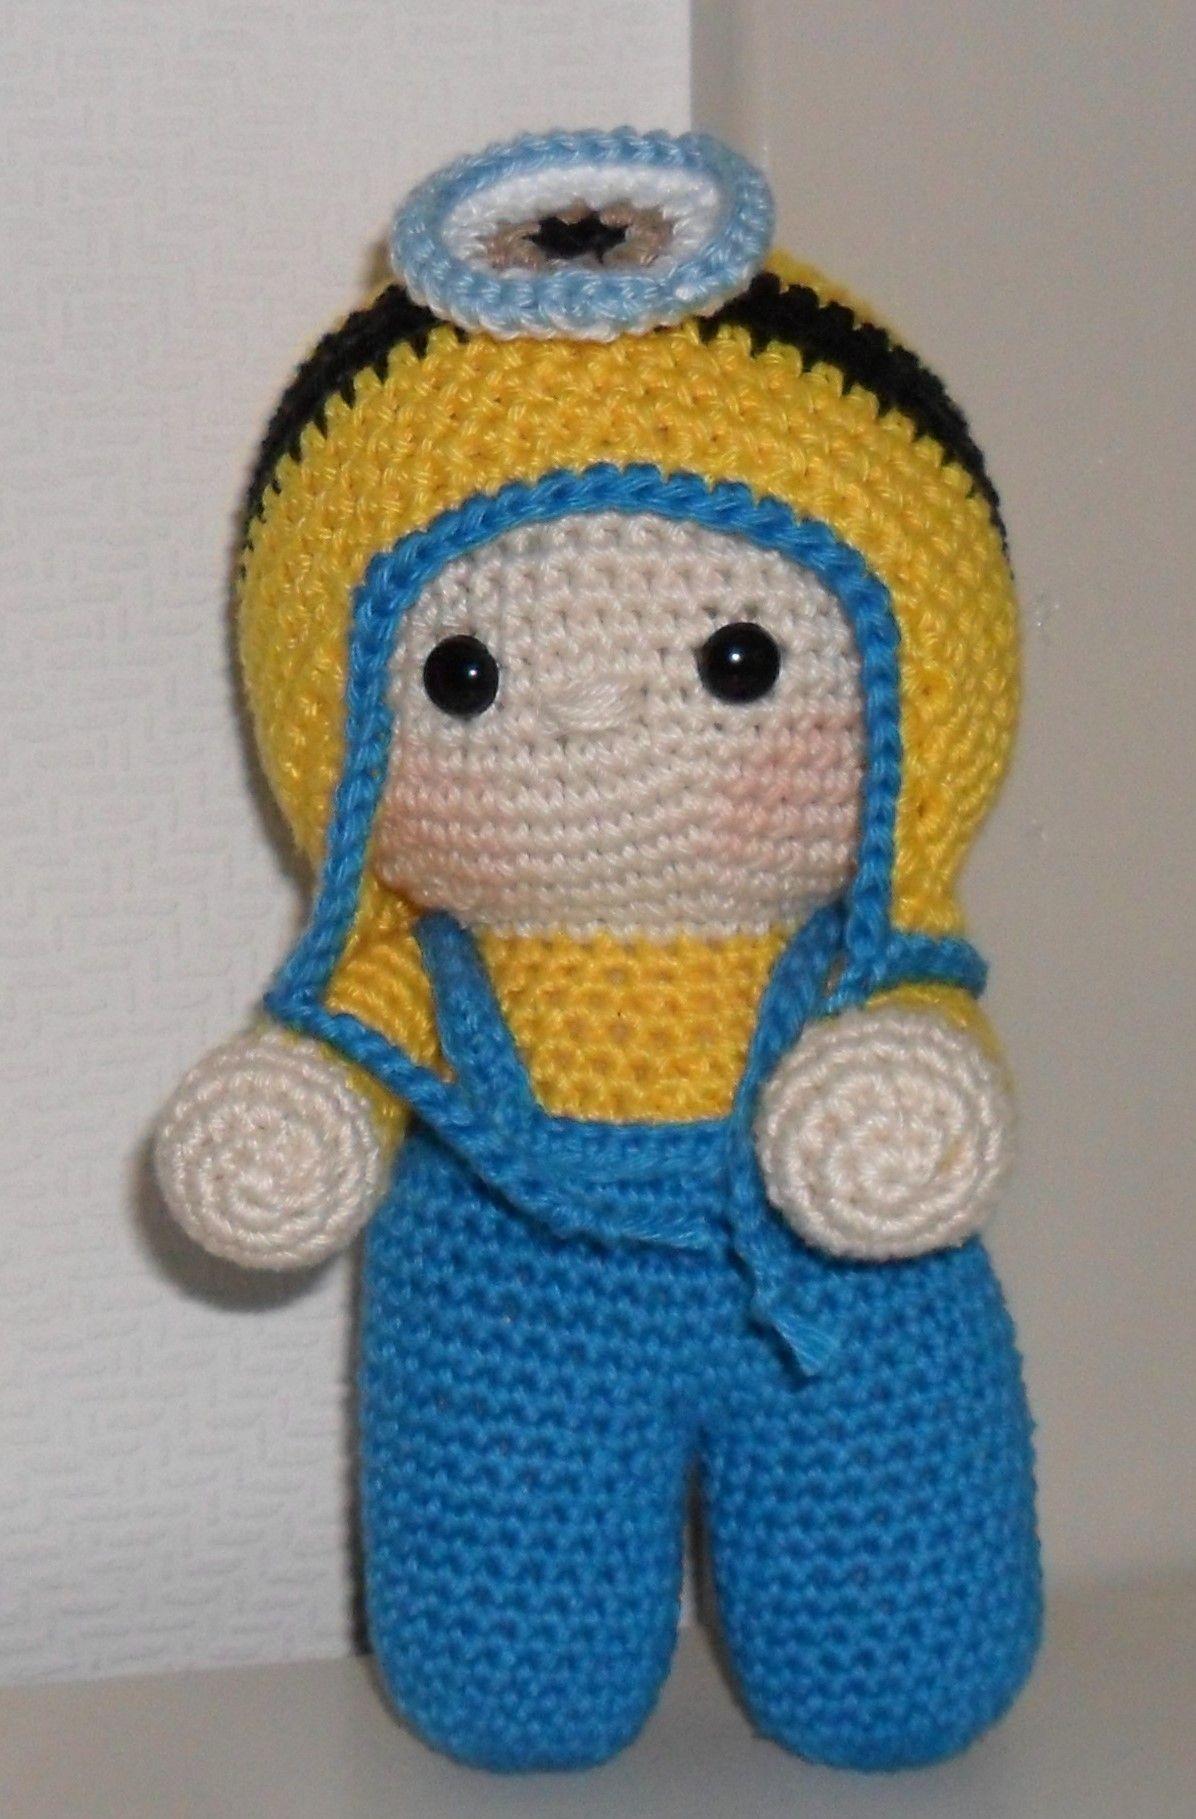 Big head doll crochet. Minion | Crochet Big Head dolls and clothes ...